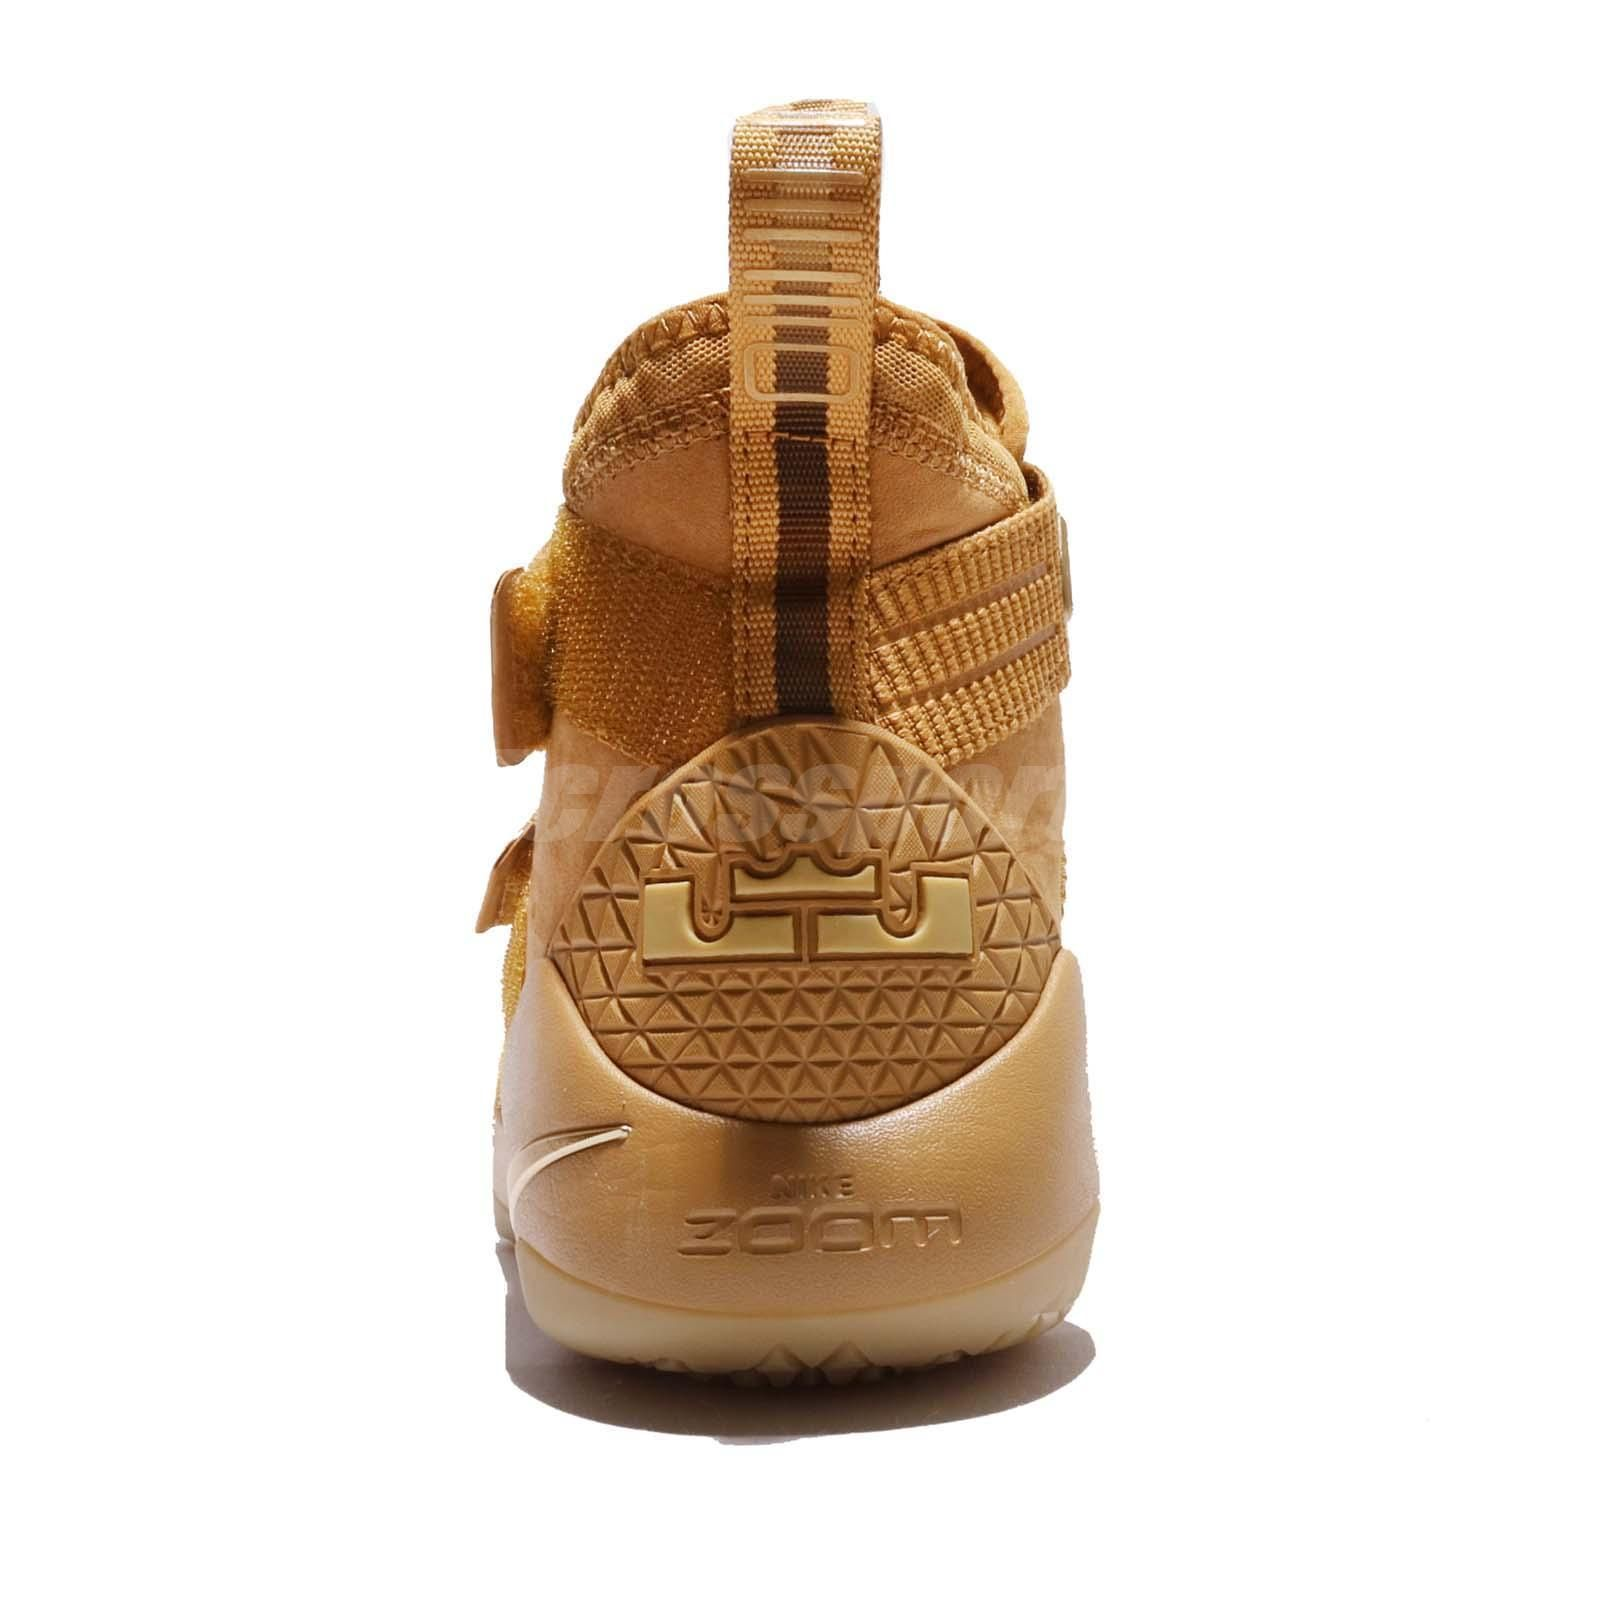 Nike Lebron Soldier XI SFG EP 11 James Wheat Gold Men Basketball 897647-700   a588a98d0